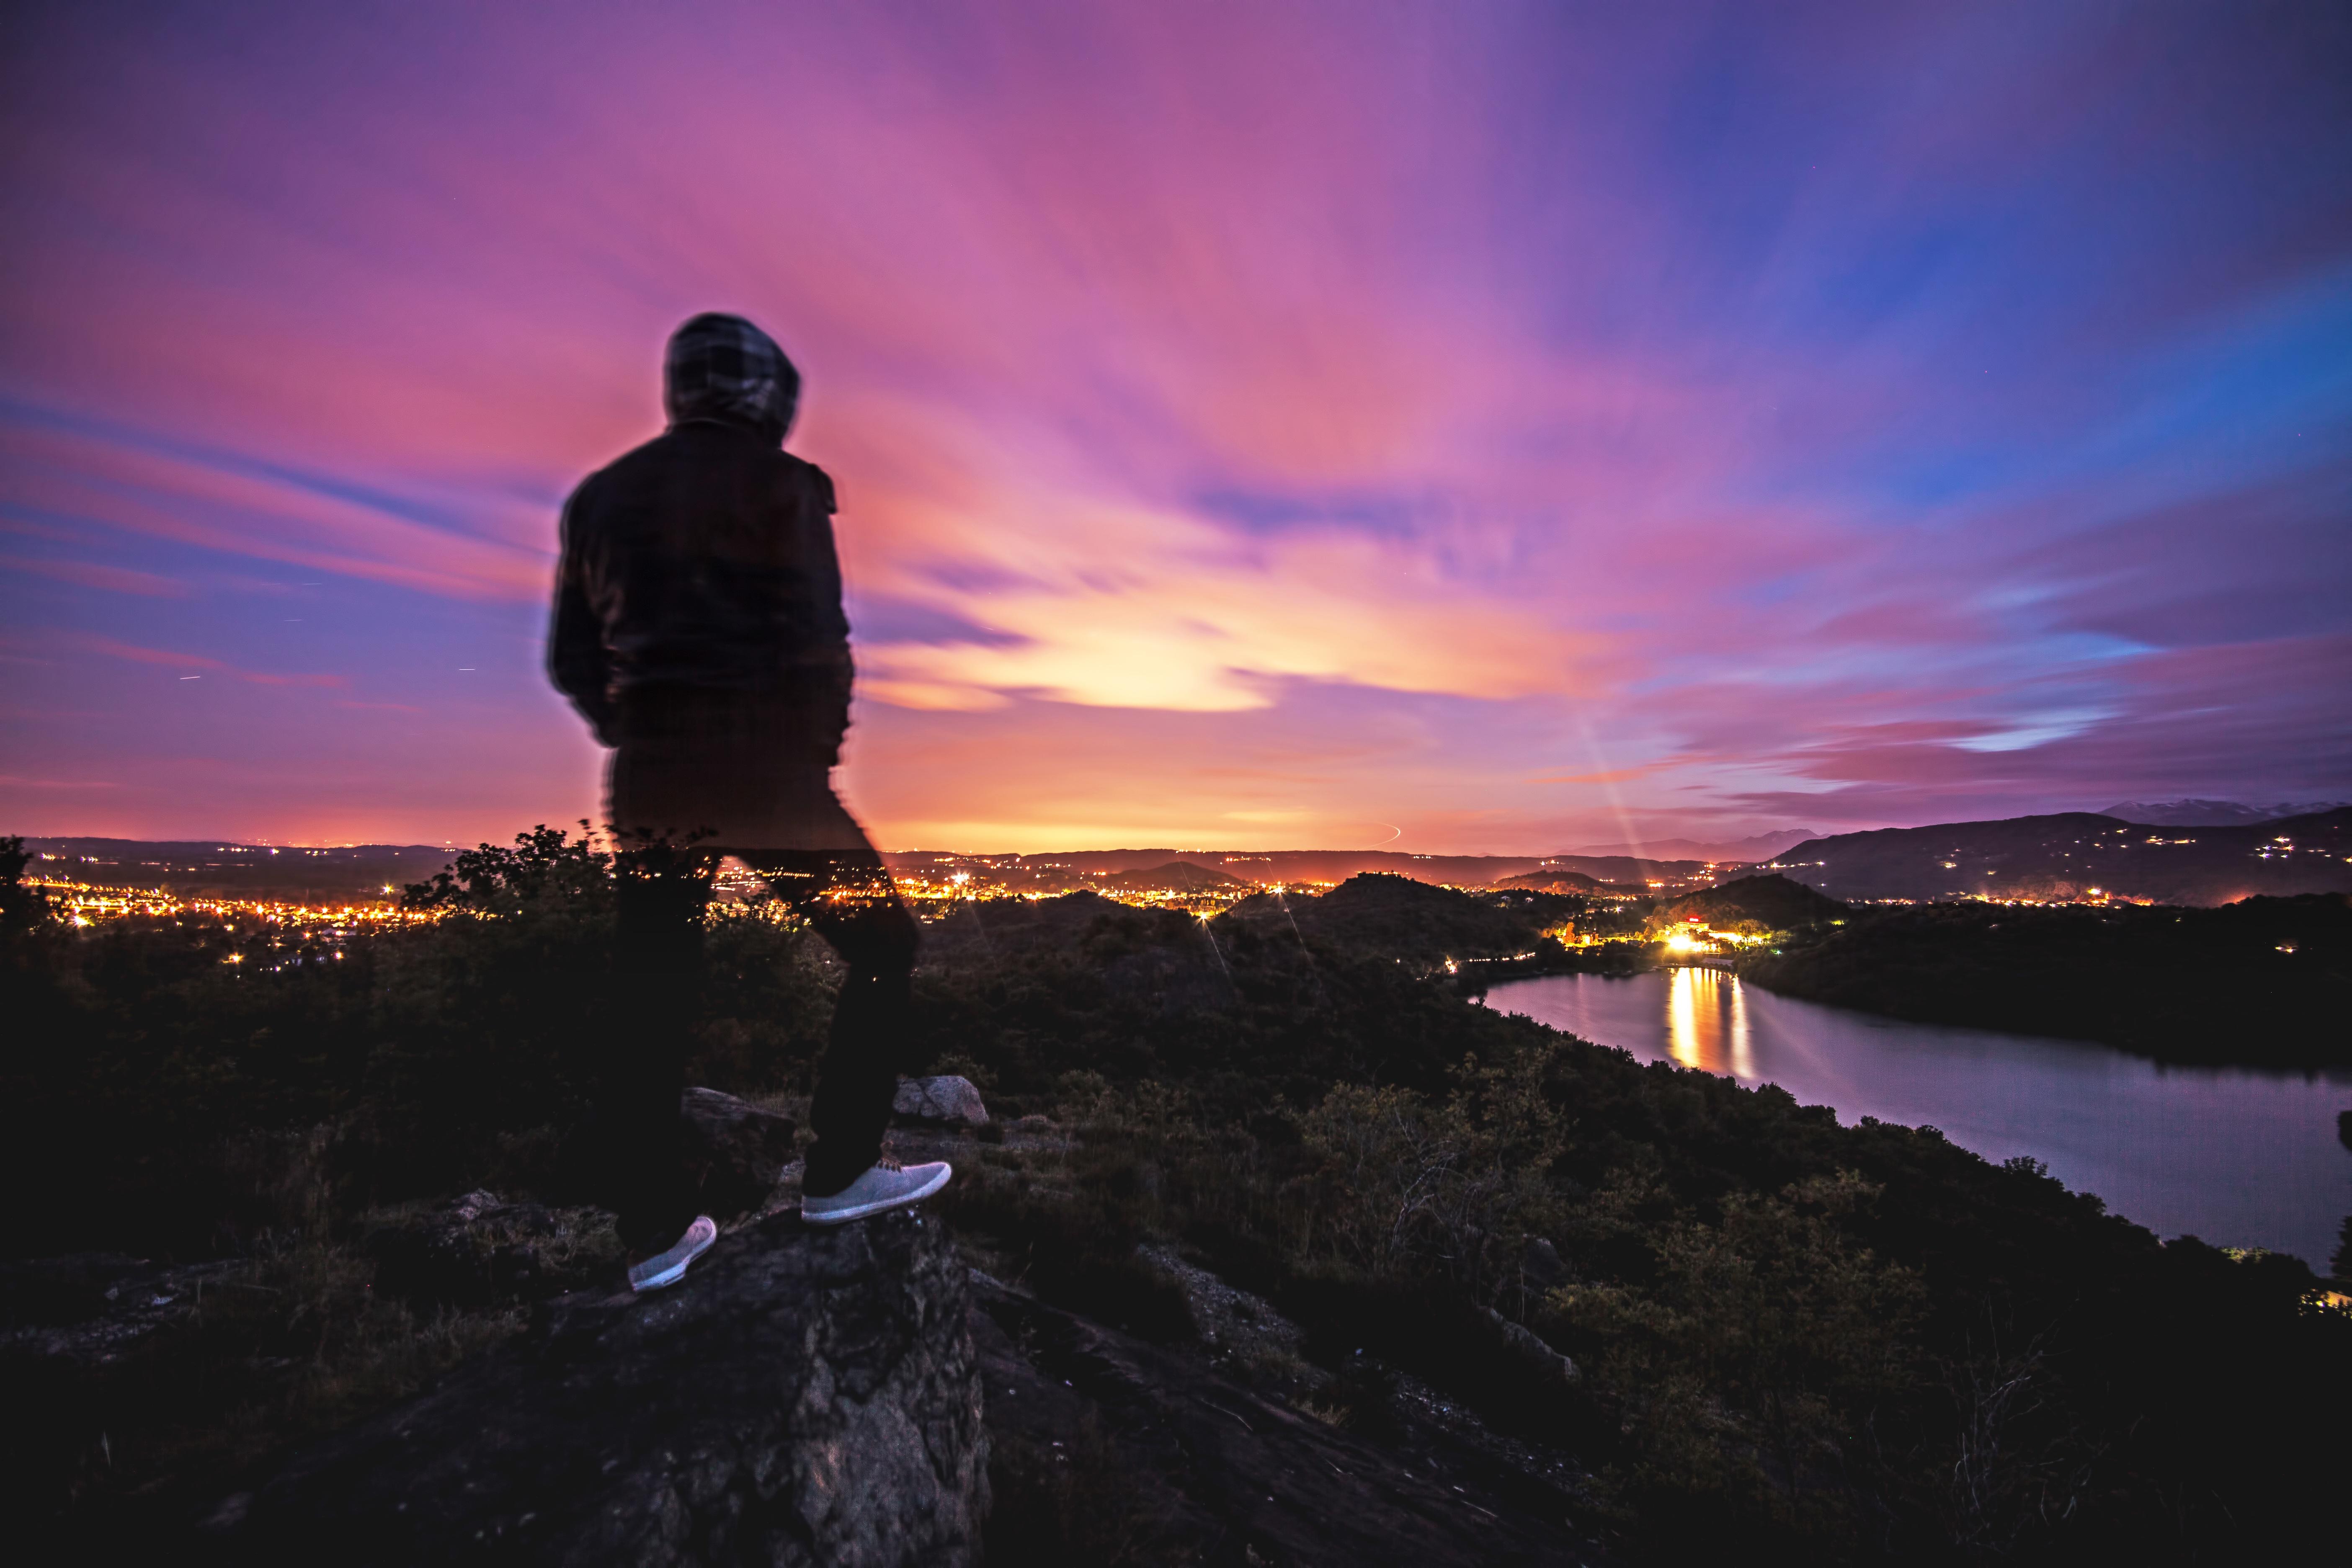 Картинки парень в капюшоне на закате